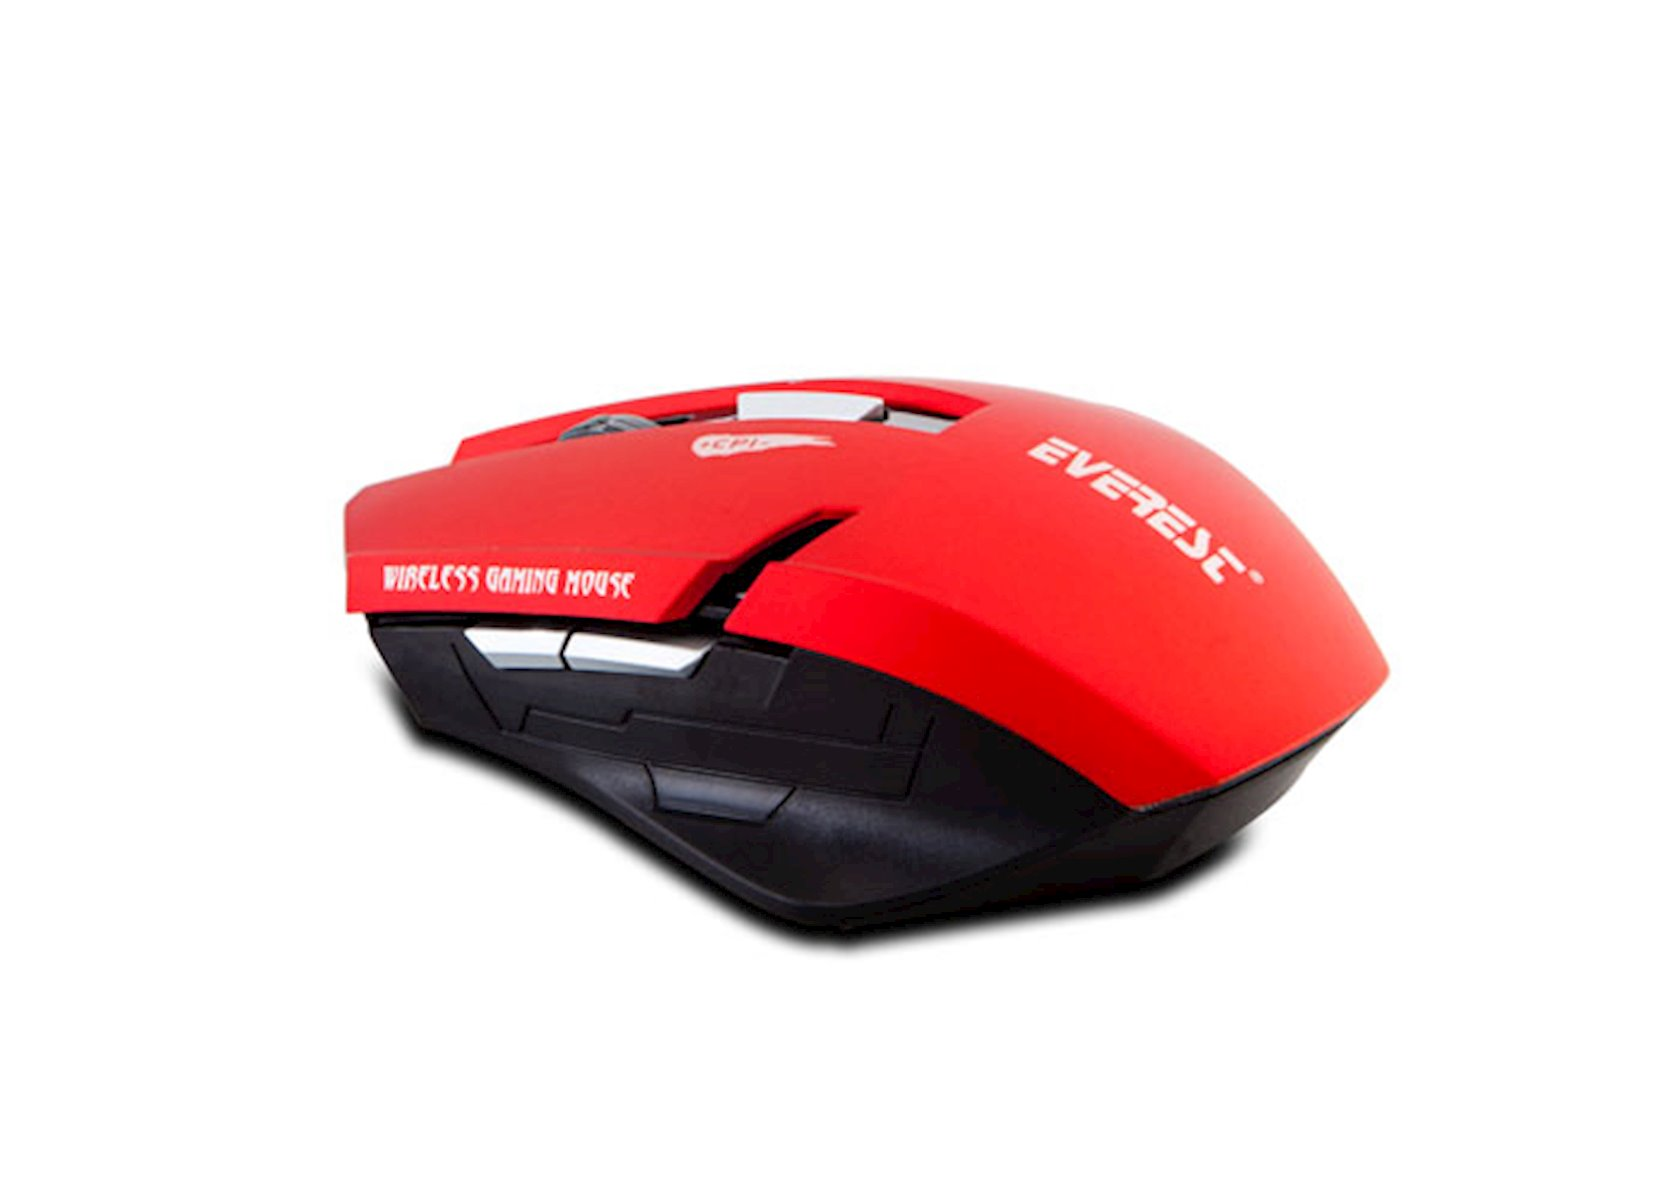 Simsiz optik kompüter siçanı Everest KM-240 USB, qırmızı